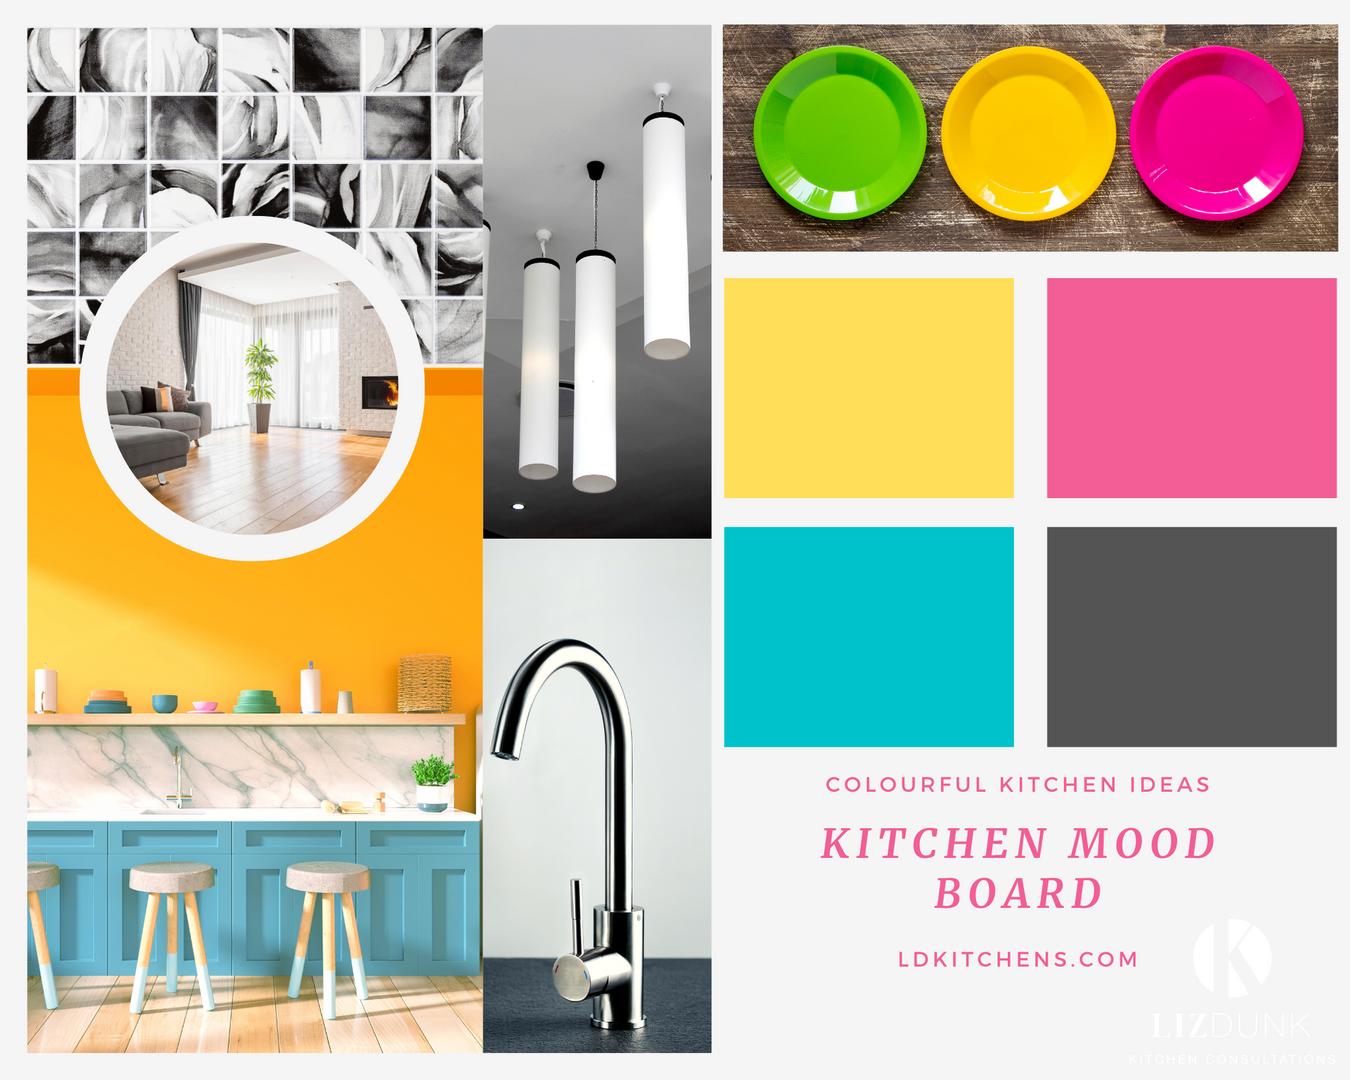 Minimalist Mood Board Photo Collage.png